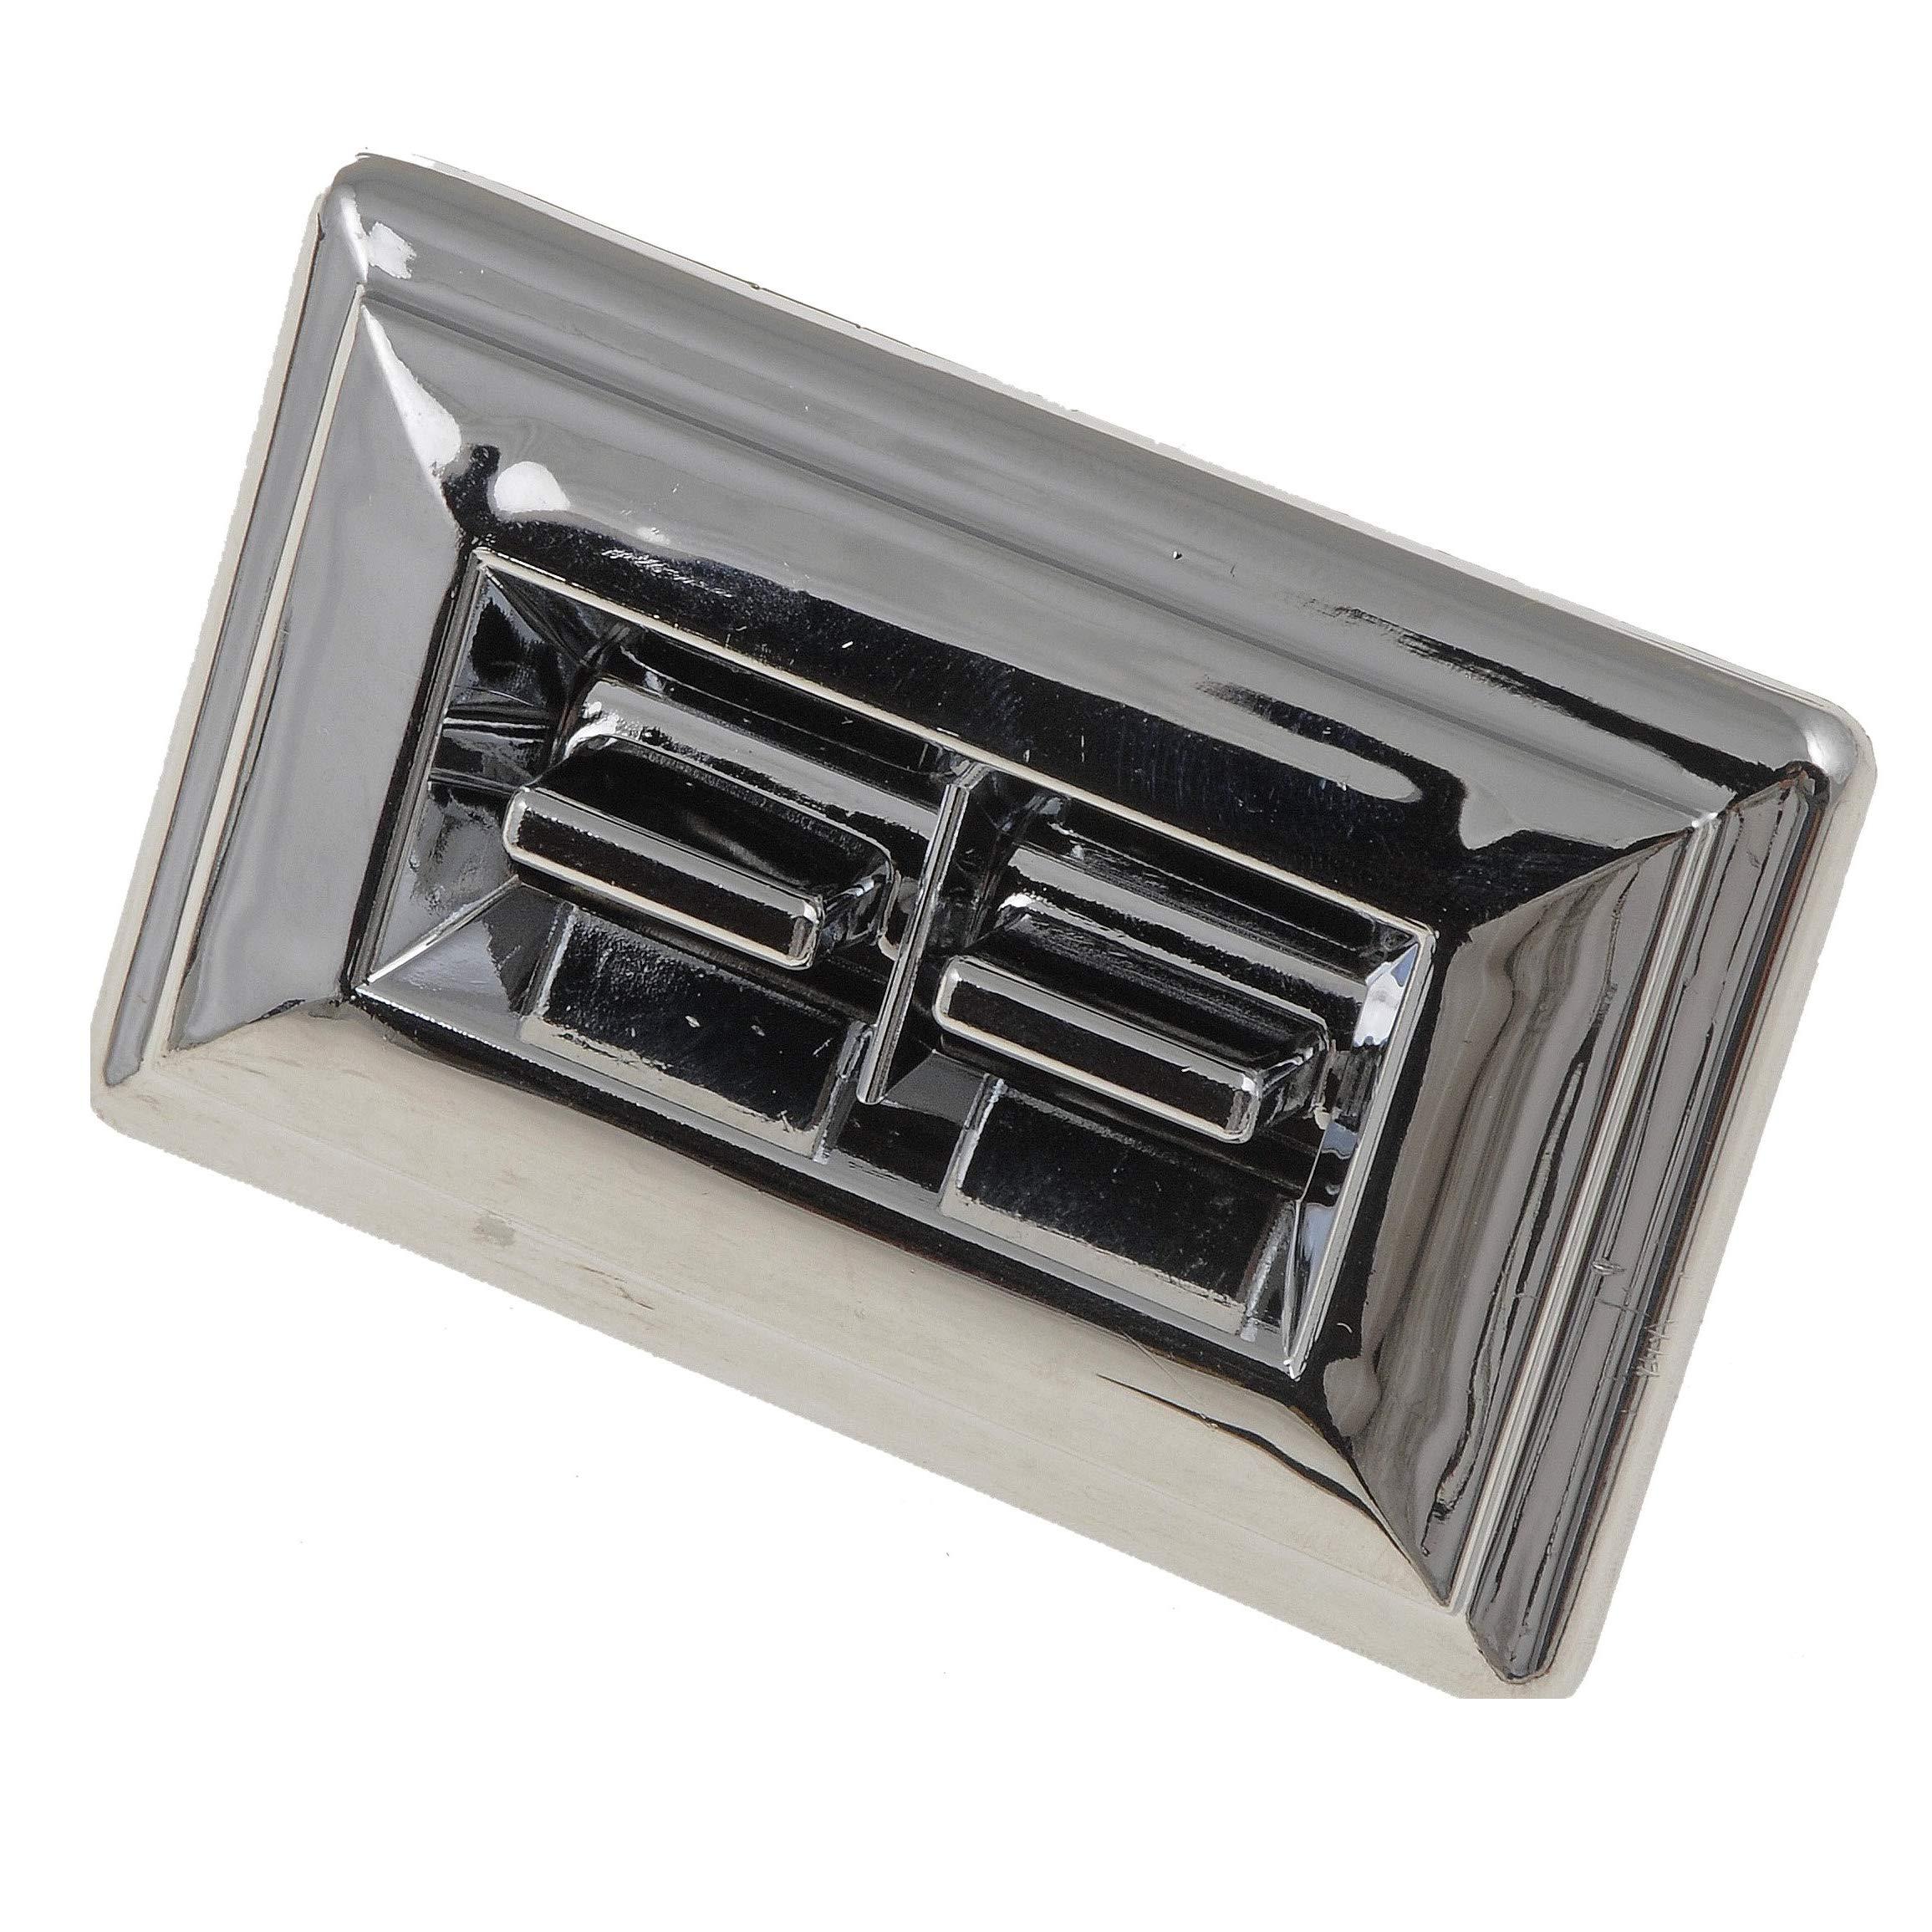 Dorman 901-017 Front Driver Side Door Window Switch for Select Models, Pewter , Black